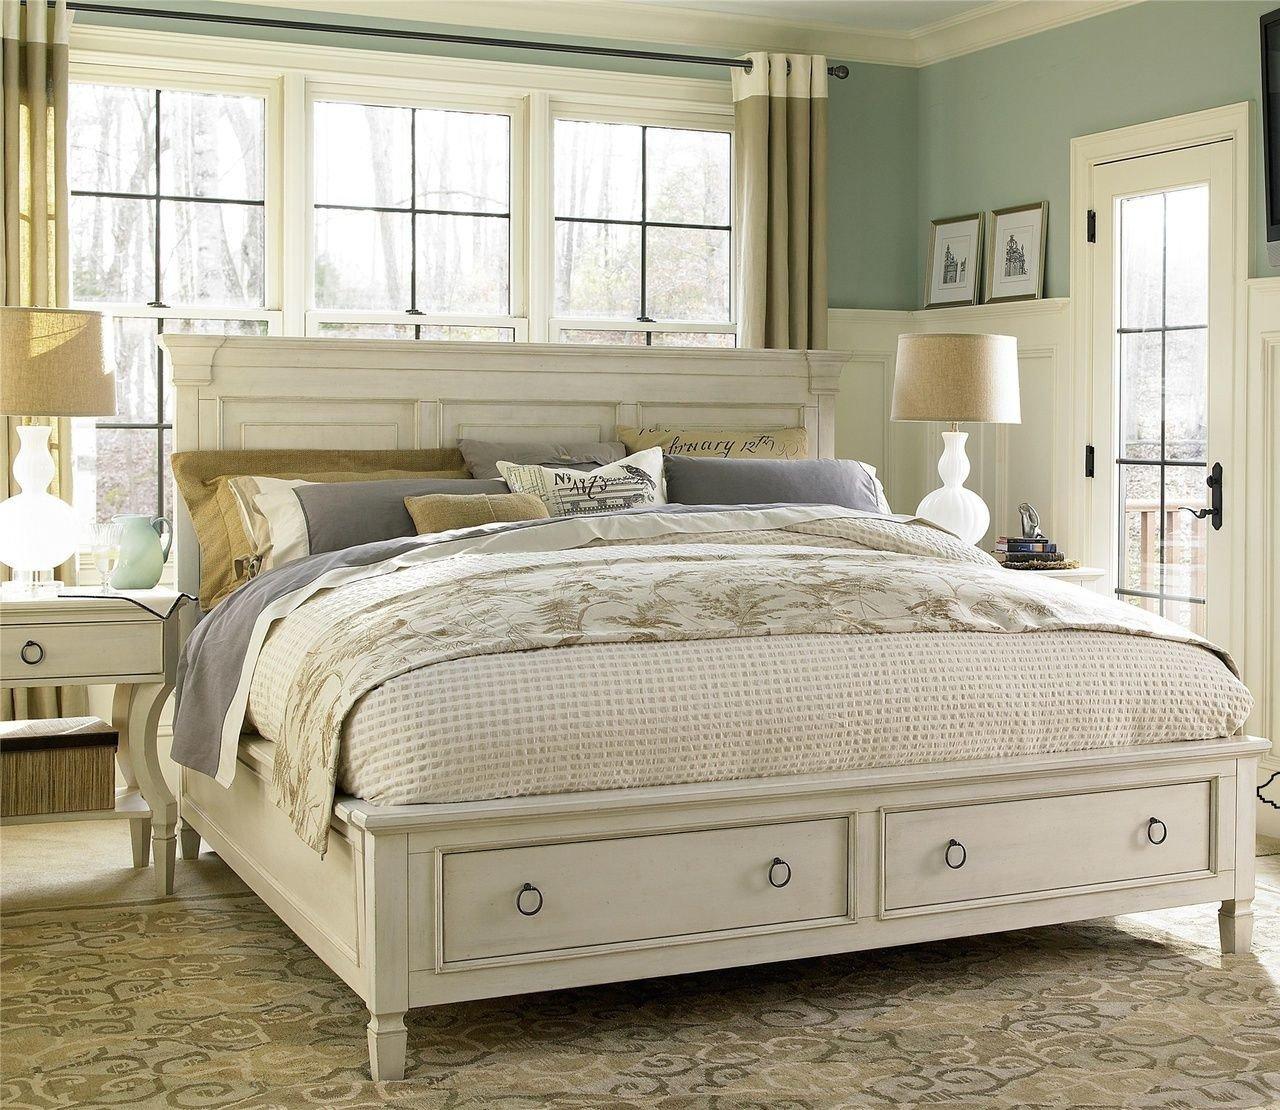 White King Size Bedroom Set Elegant Country Chic Wood King Size White Storage Bed